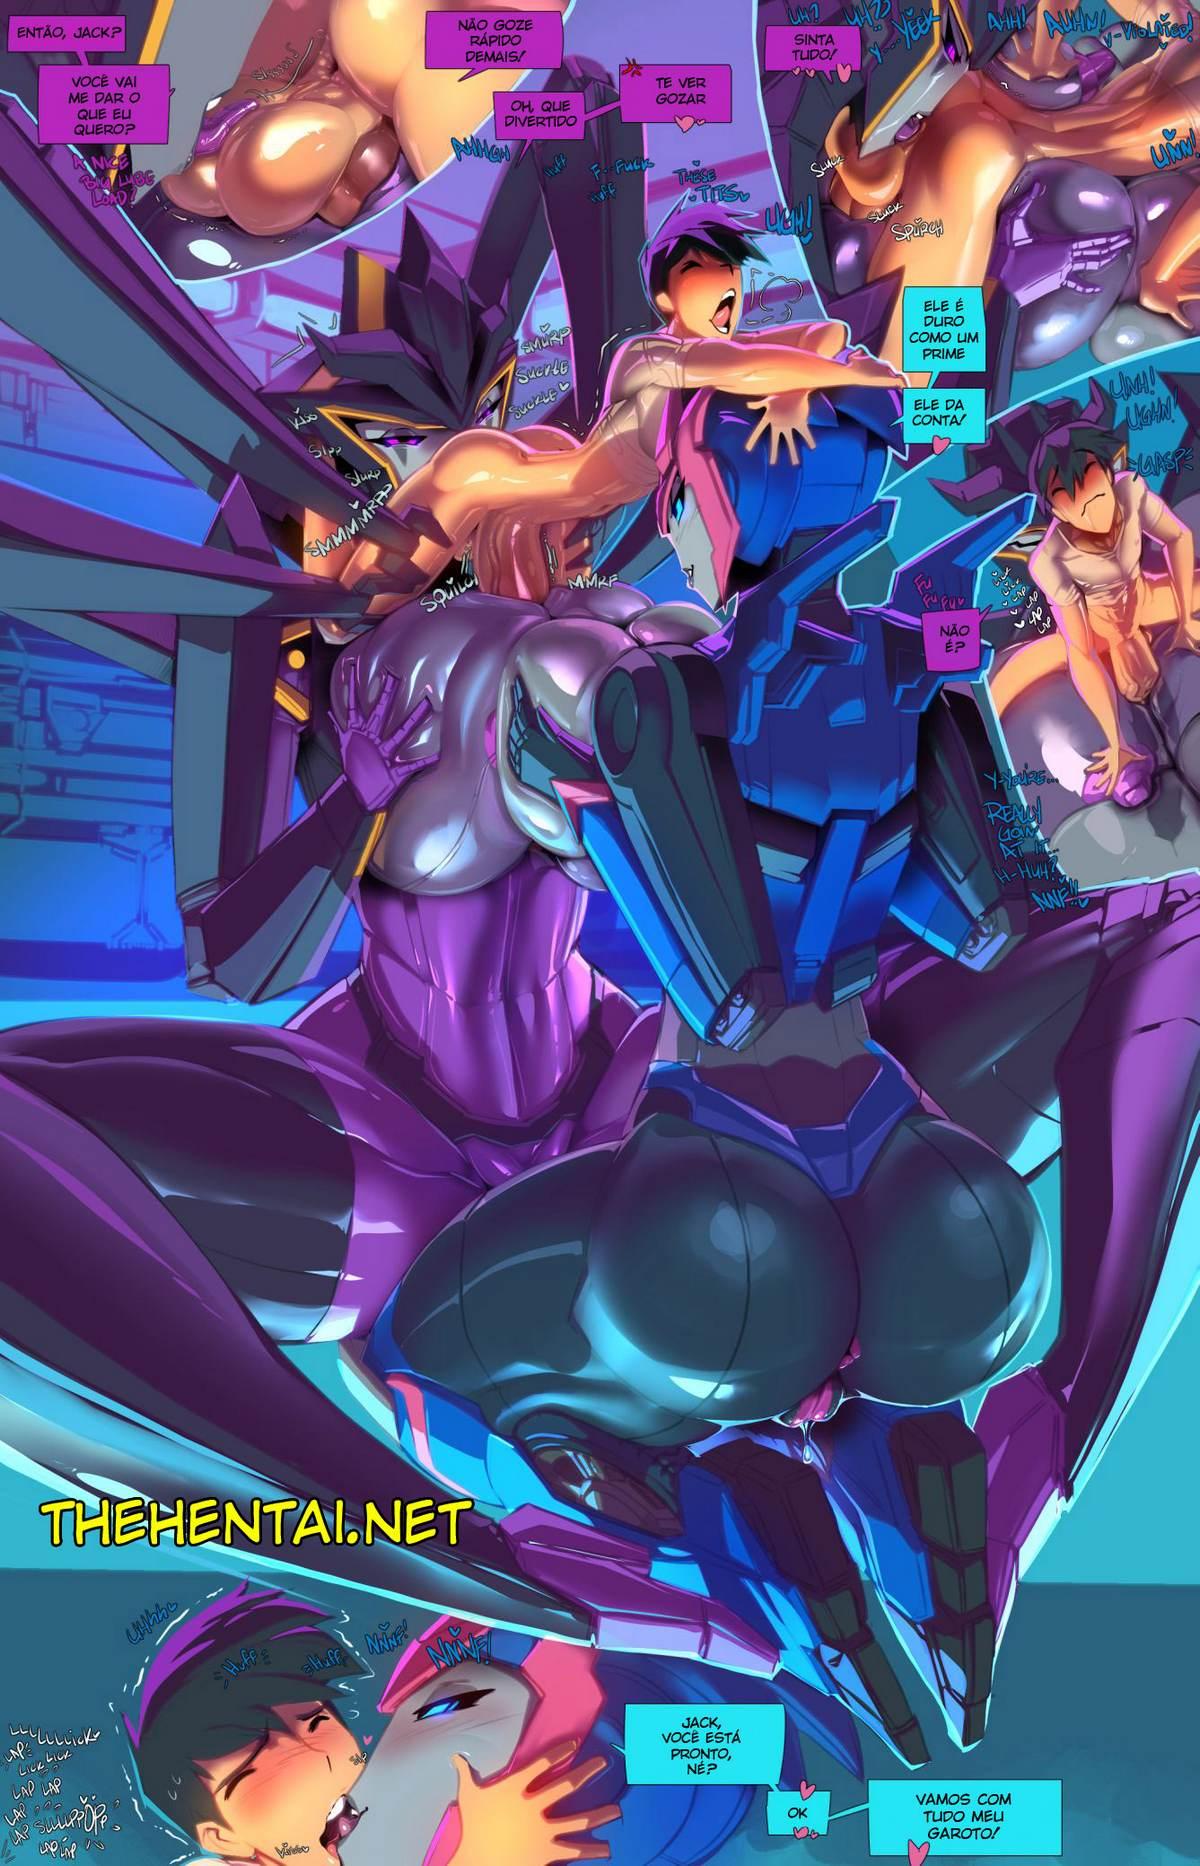 The Full Course tranformers Hentai pt br 13 - hentai, exclusiva, comics-hq